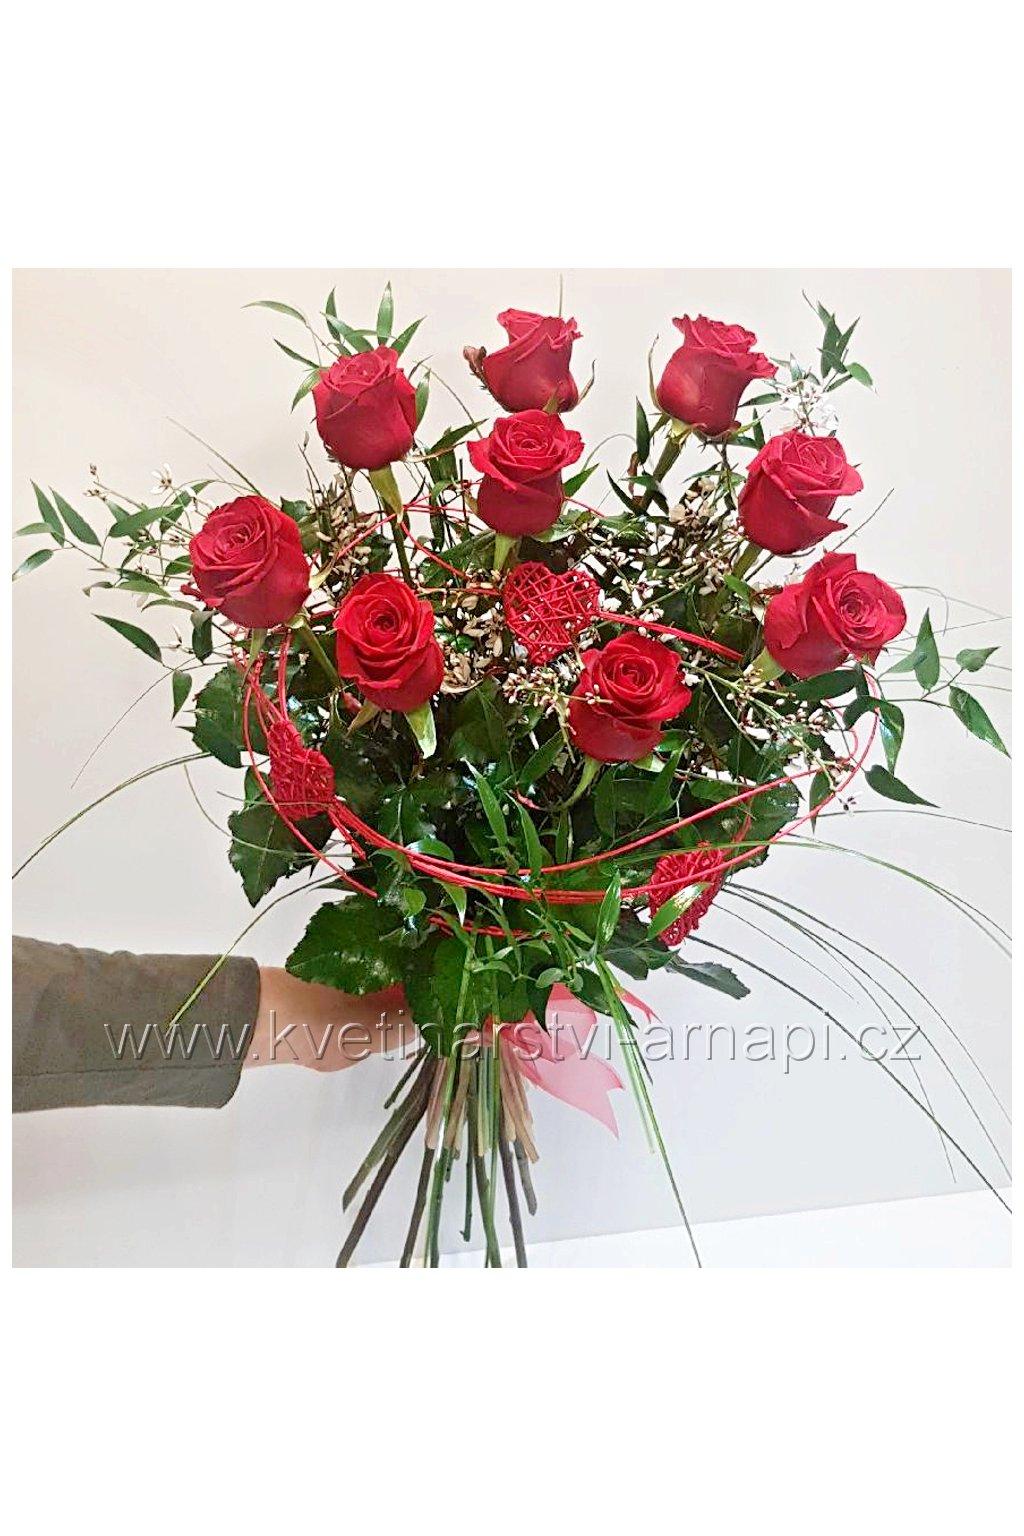 kytice z lasky ruze kvetinarstvi arnapi